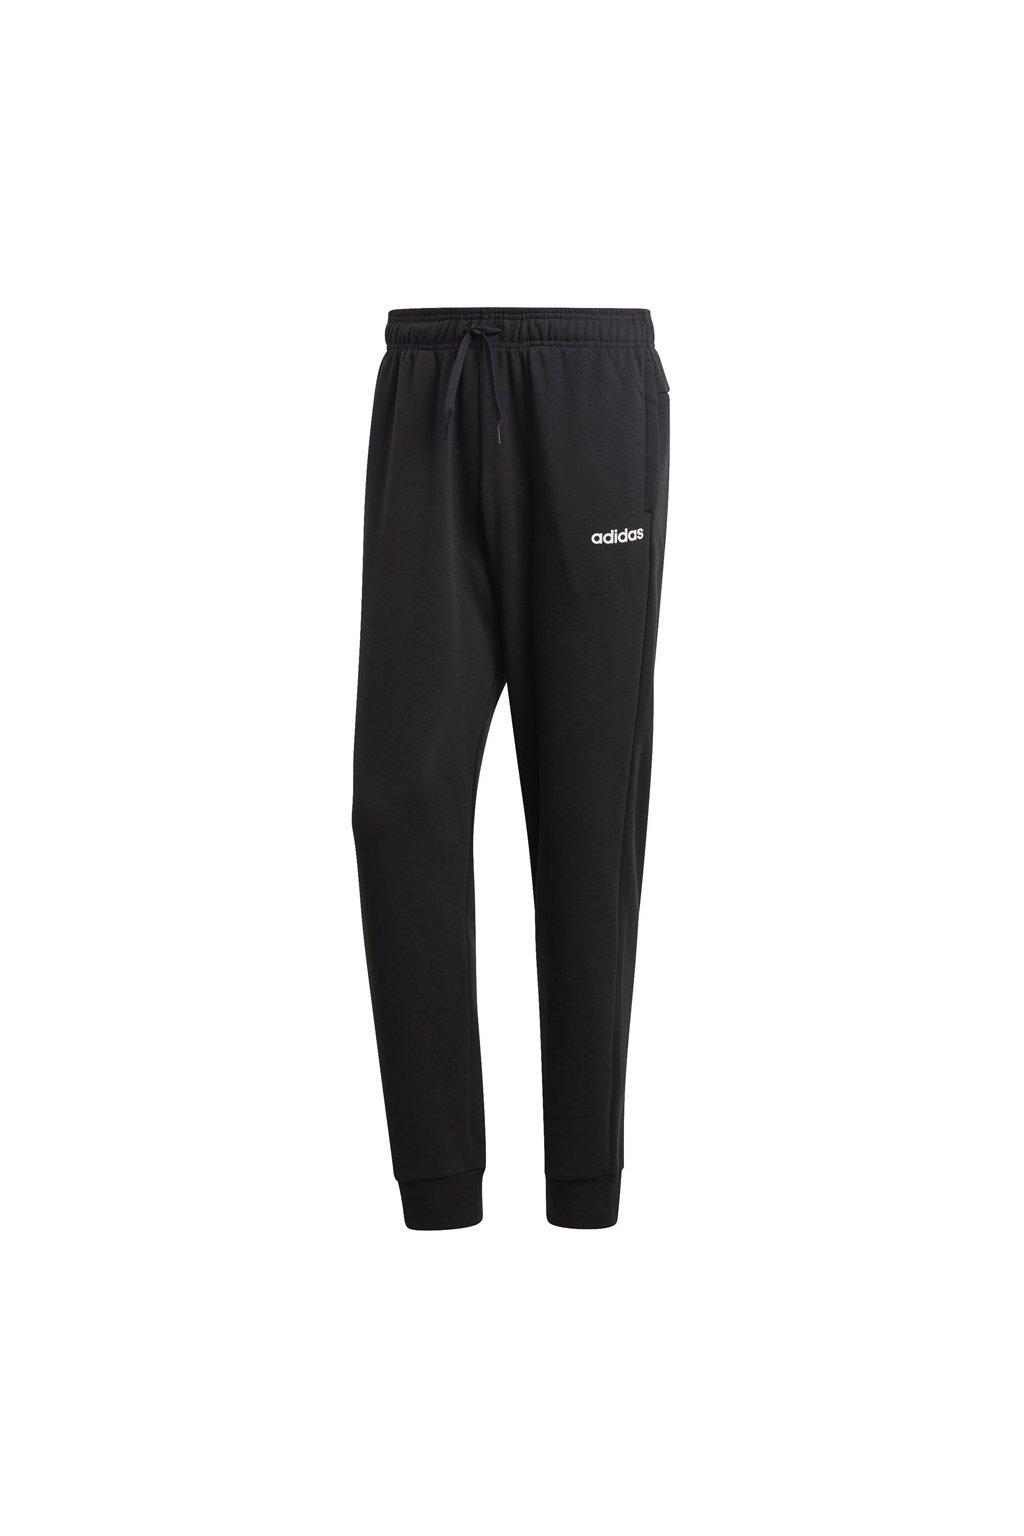 Pánske tepláky Adidas Essentials Plain Slim Pant FT čierne DU0372